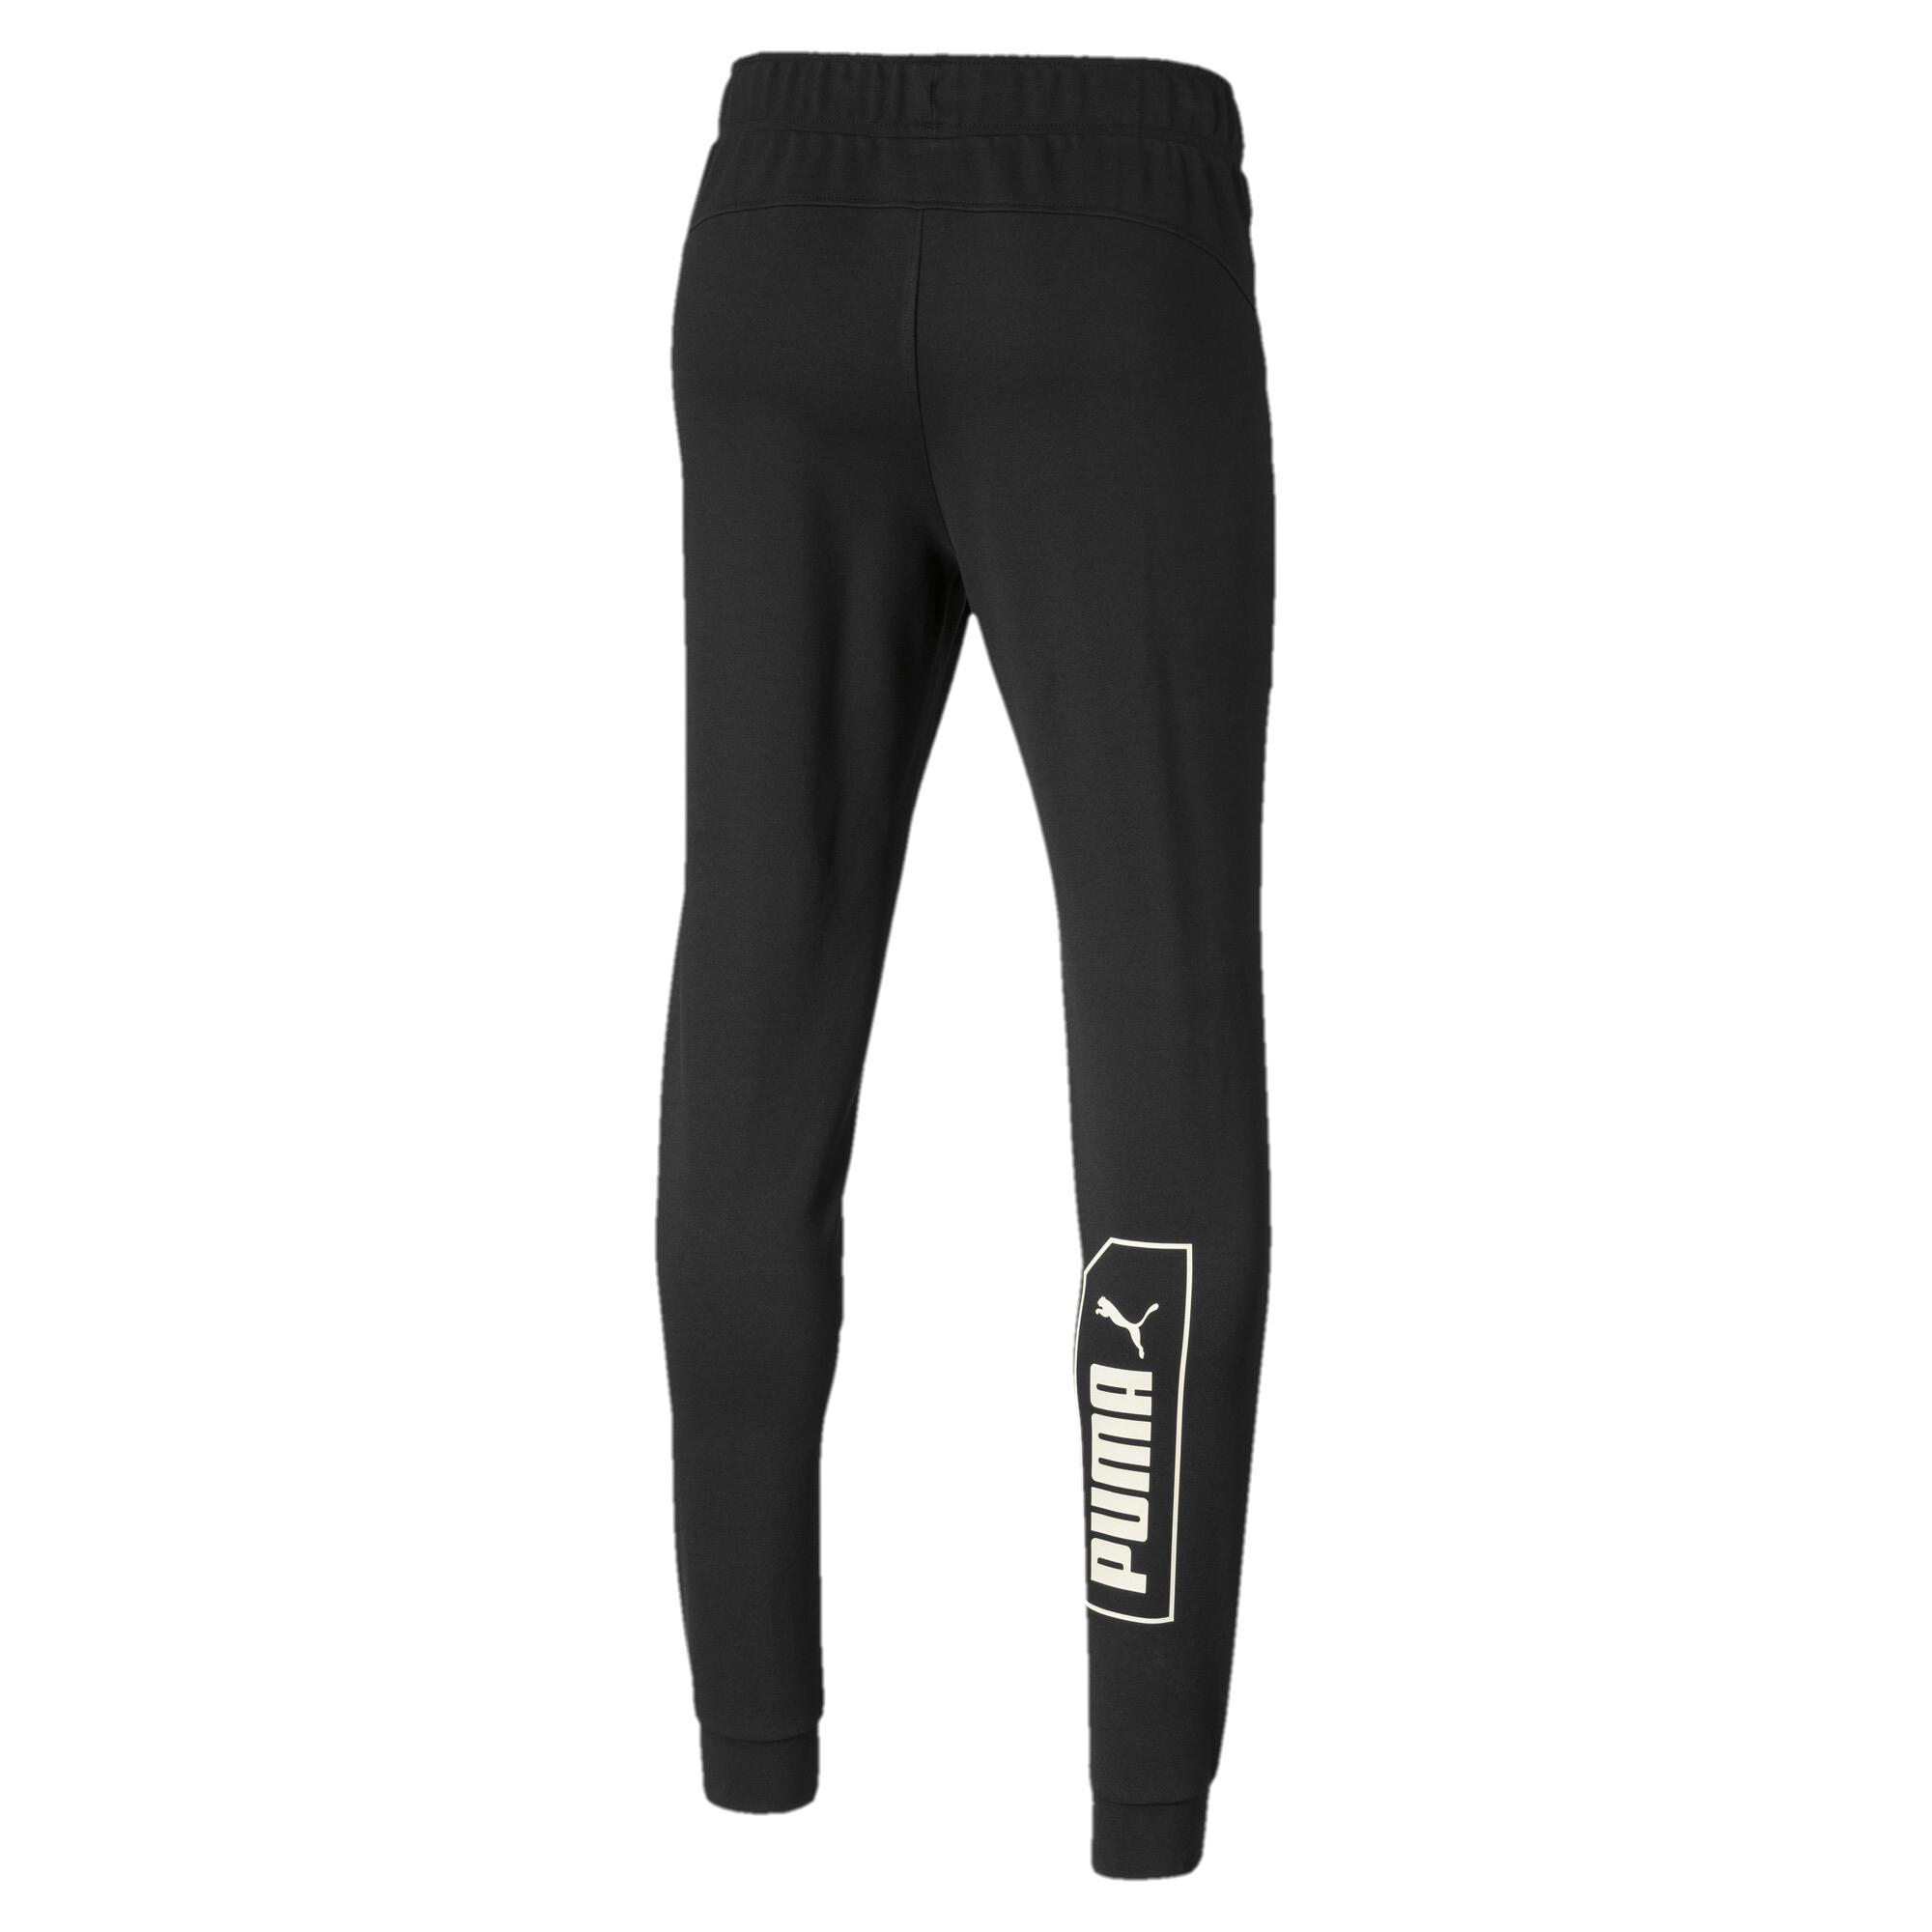 PUMA-NU-TILITY-Men-039-s-Sweatpants-Men-Knitted-Pants-Basics thumbnail 13